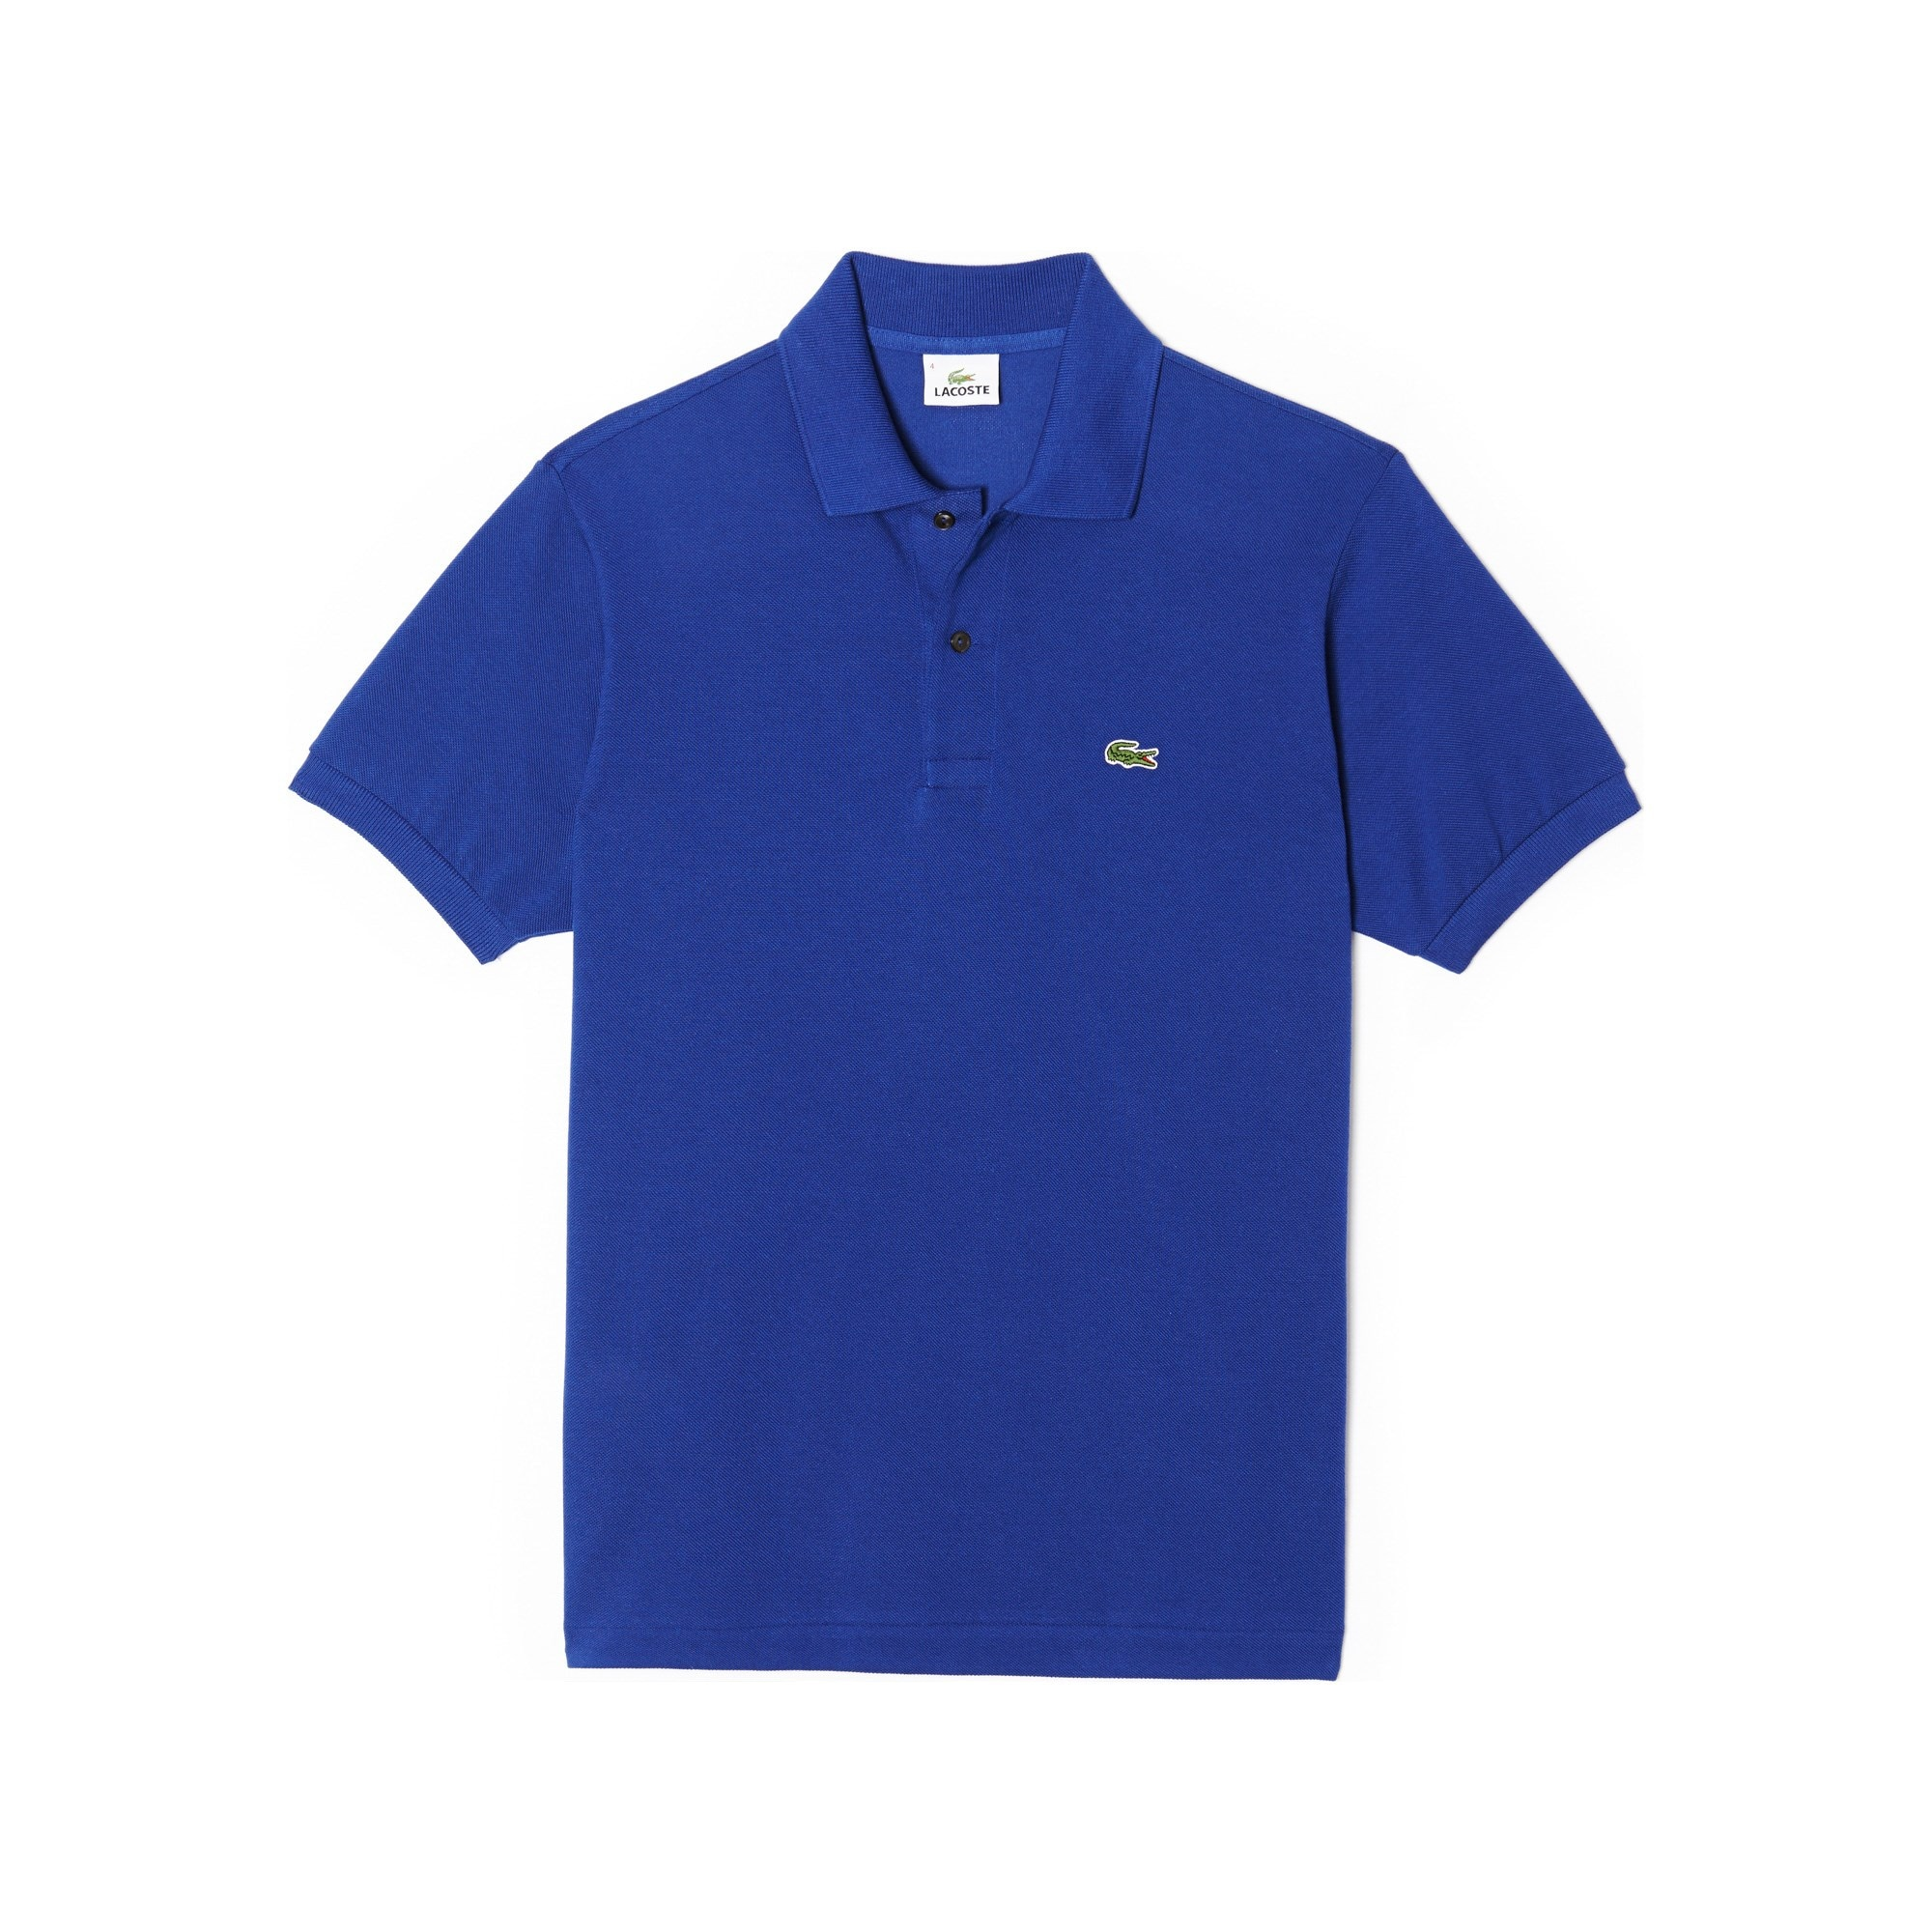 dfe8dd7384e1b Men s Clothing on Sale